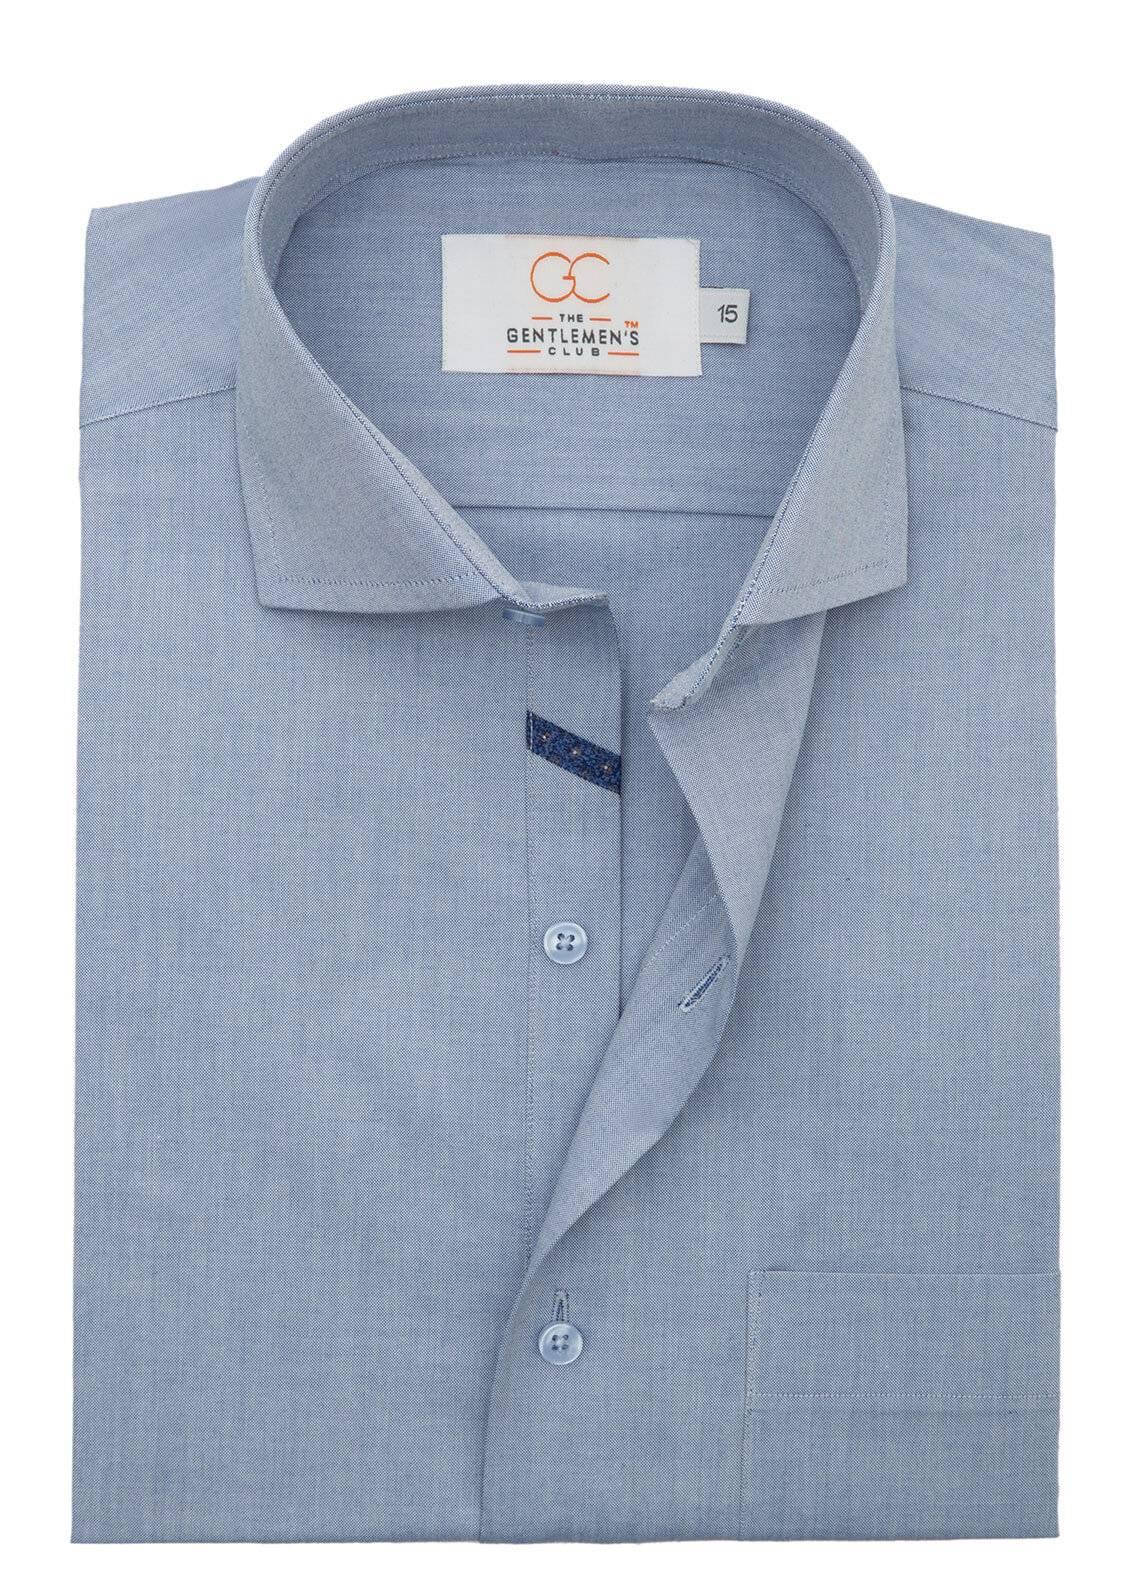 The Gentlemen's Club Cotton Formal Men Shirts - Blue White Label 4075 - 18